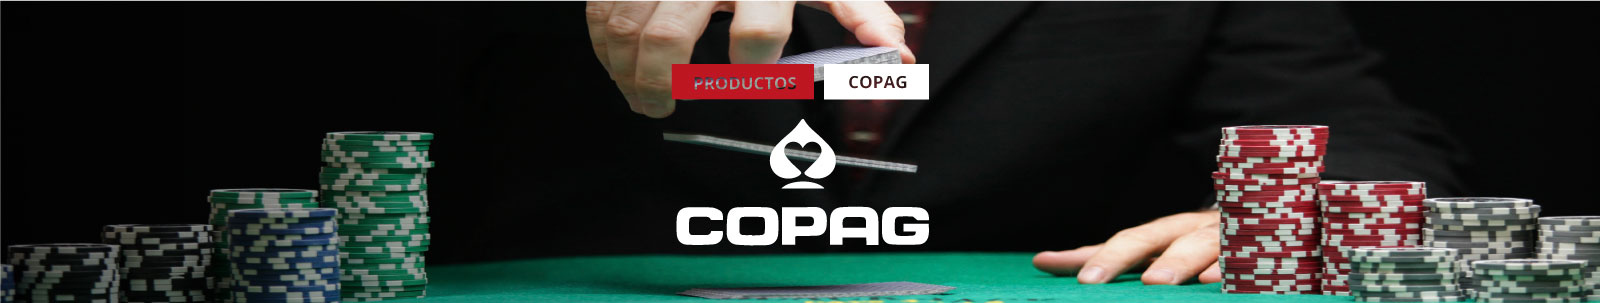 banner-Copag-02